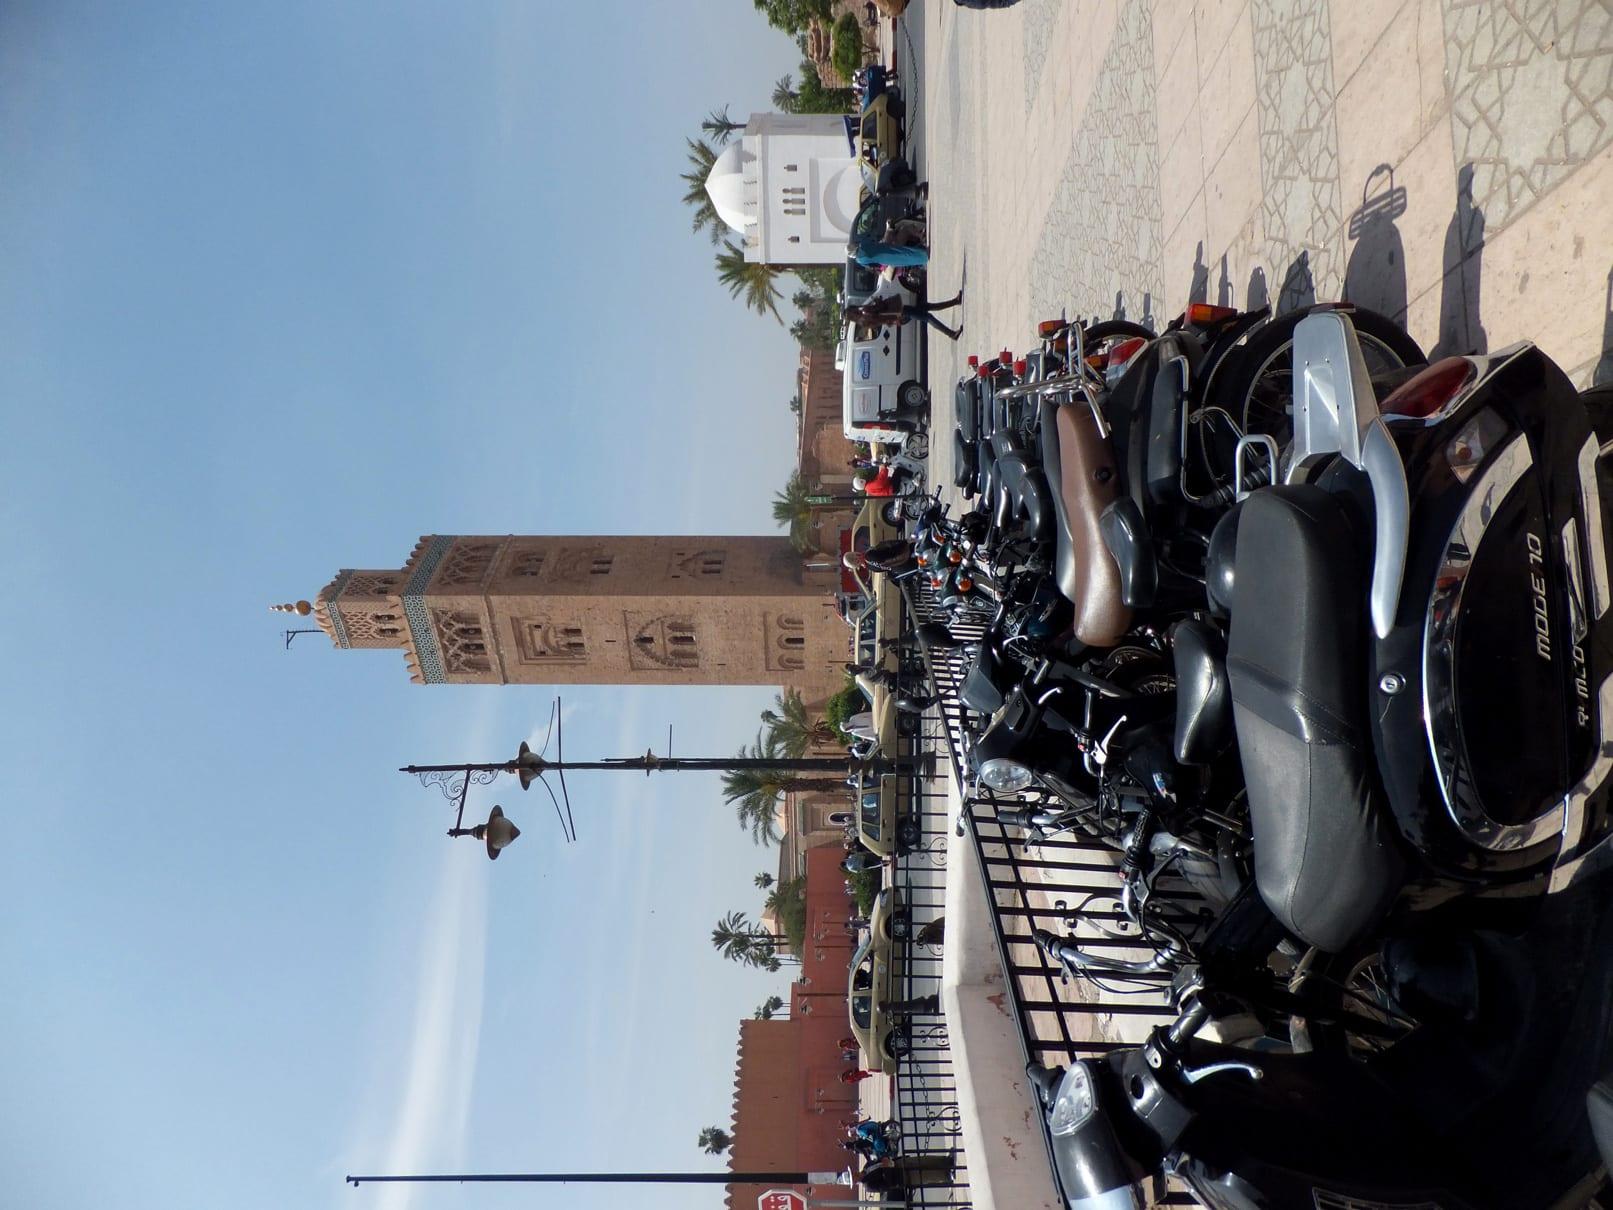 Mezquita de la Koutoubia Marruecos